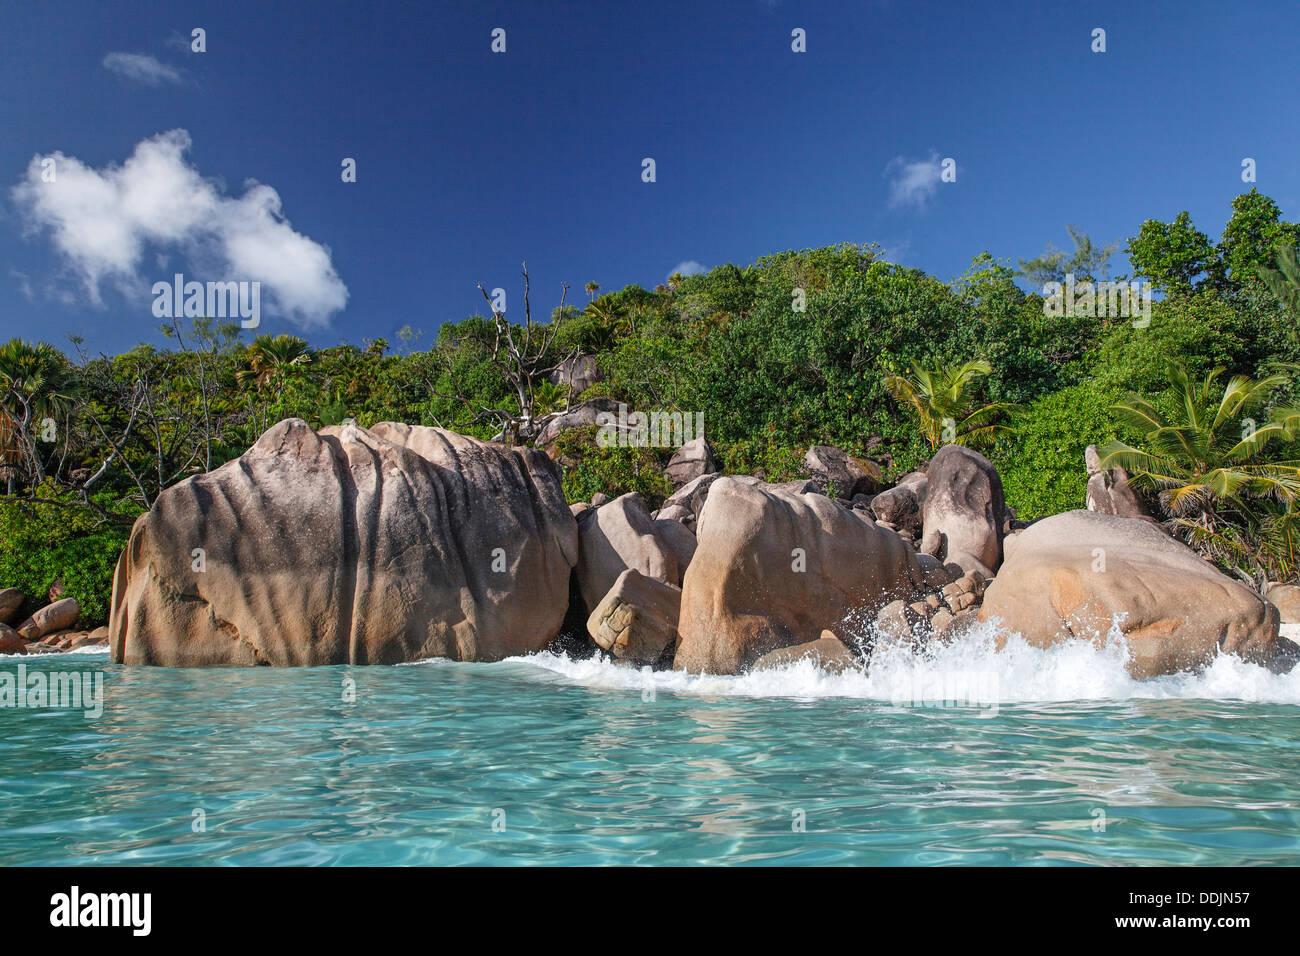 Granite boulders on the shore at Anse Lazio, Baie Sainte Anne district, Island of Praslin, Seychelles, Indian Ocean, Africa - Stock Image